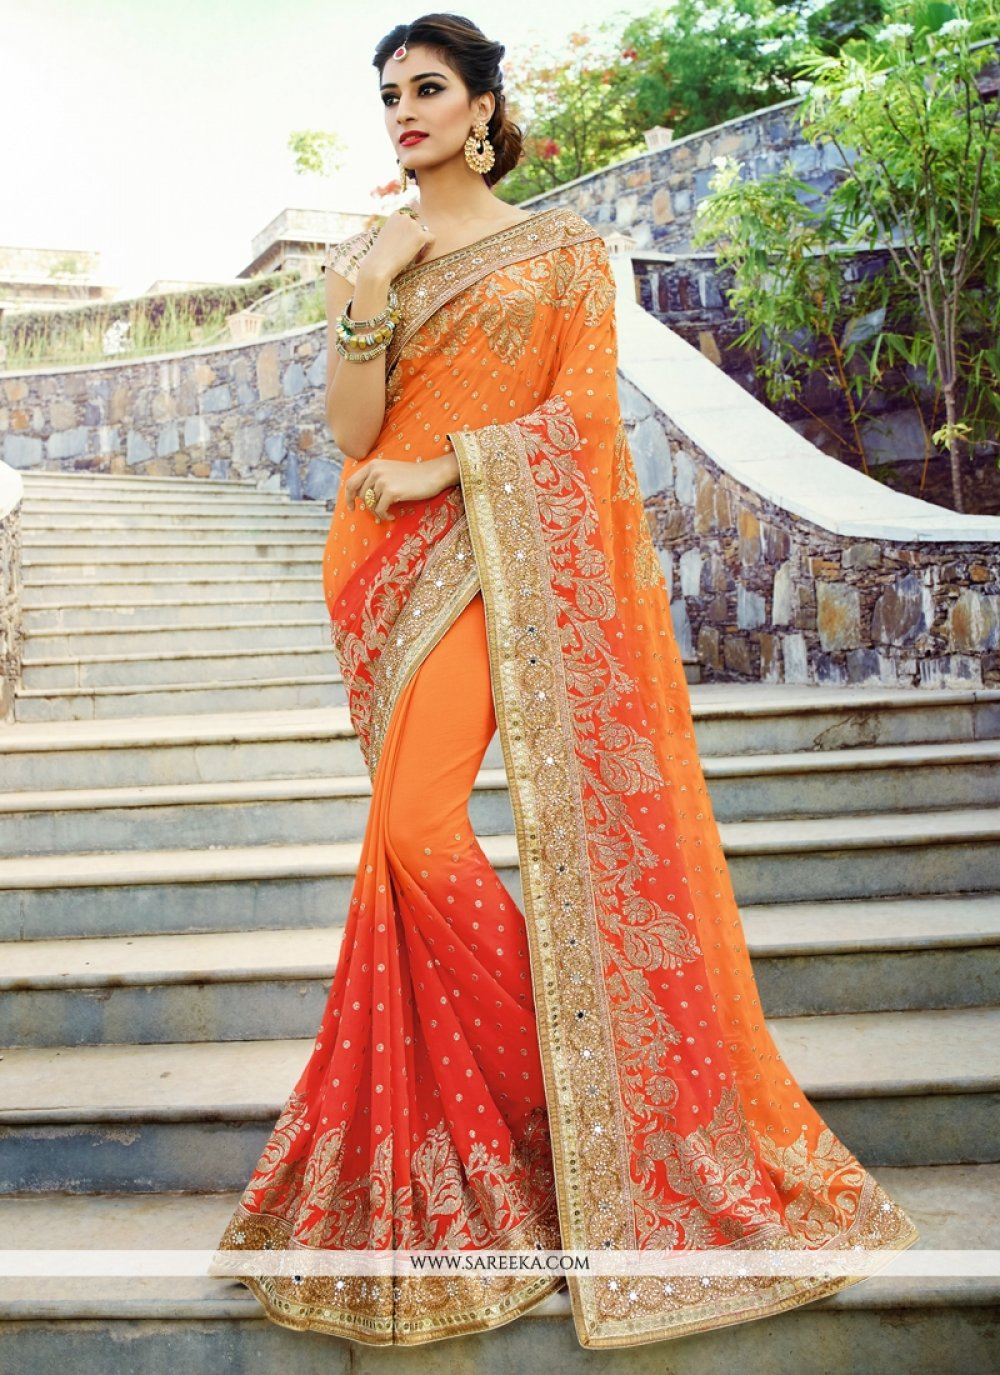 Beguiling Patch Border Work Red and Orange Designer Saree